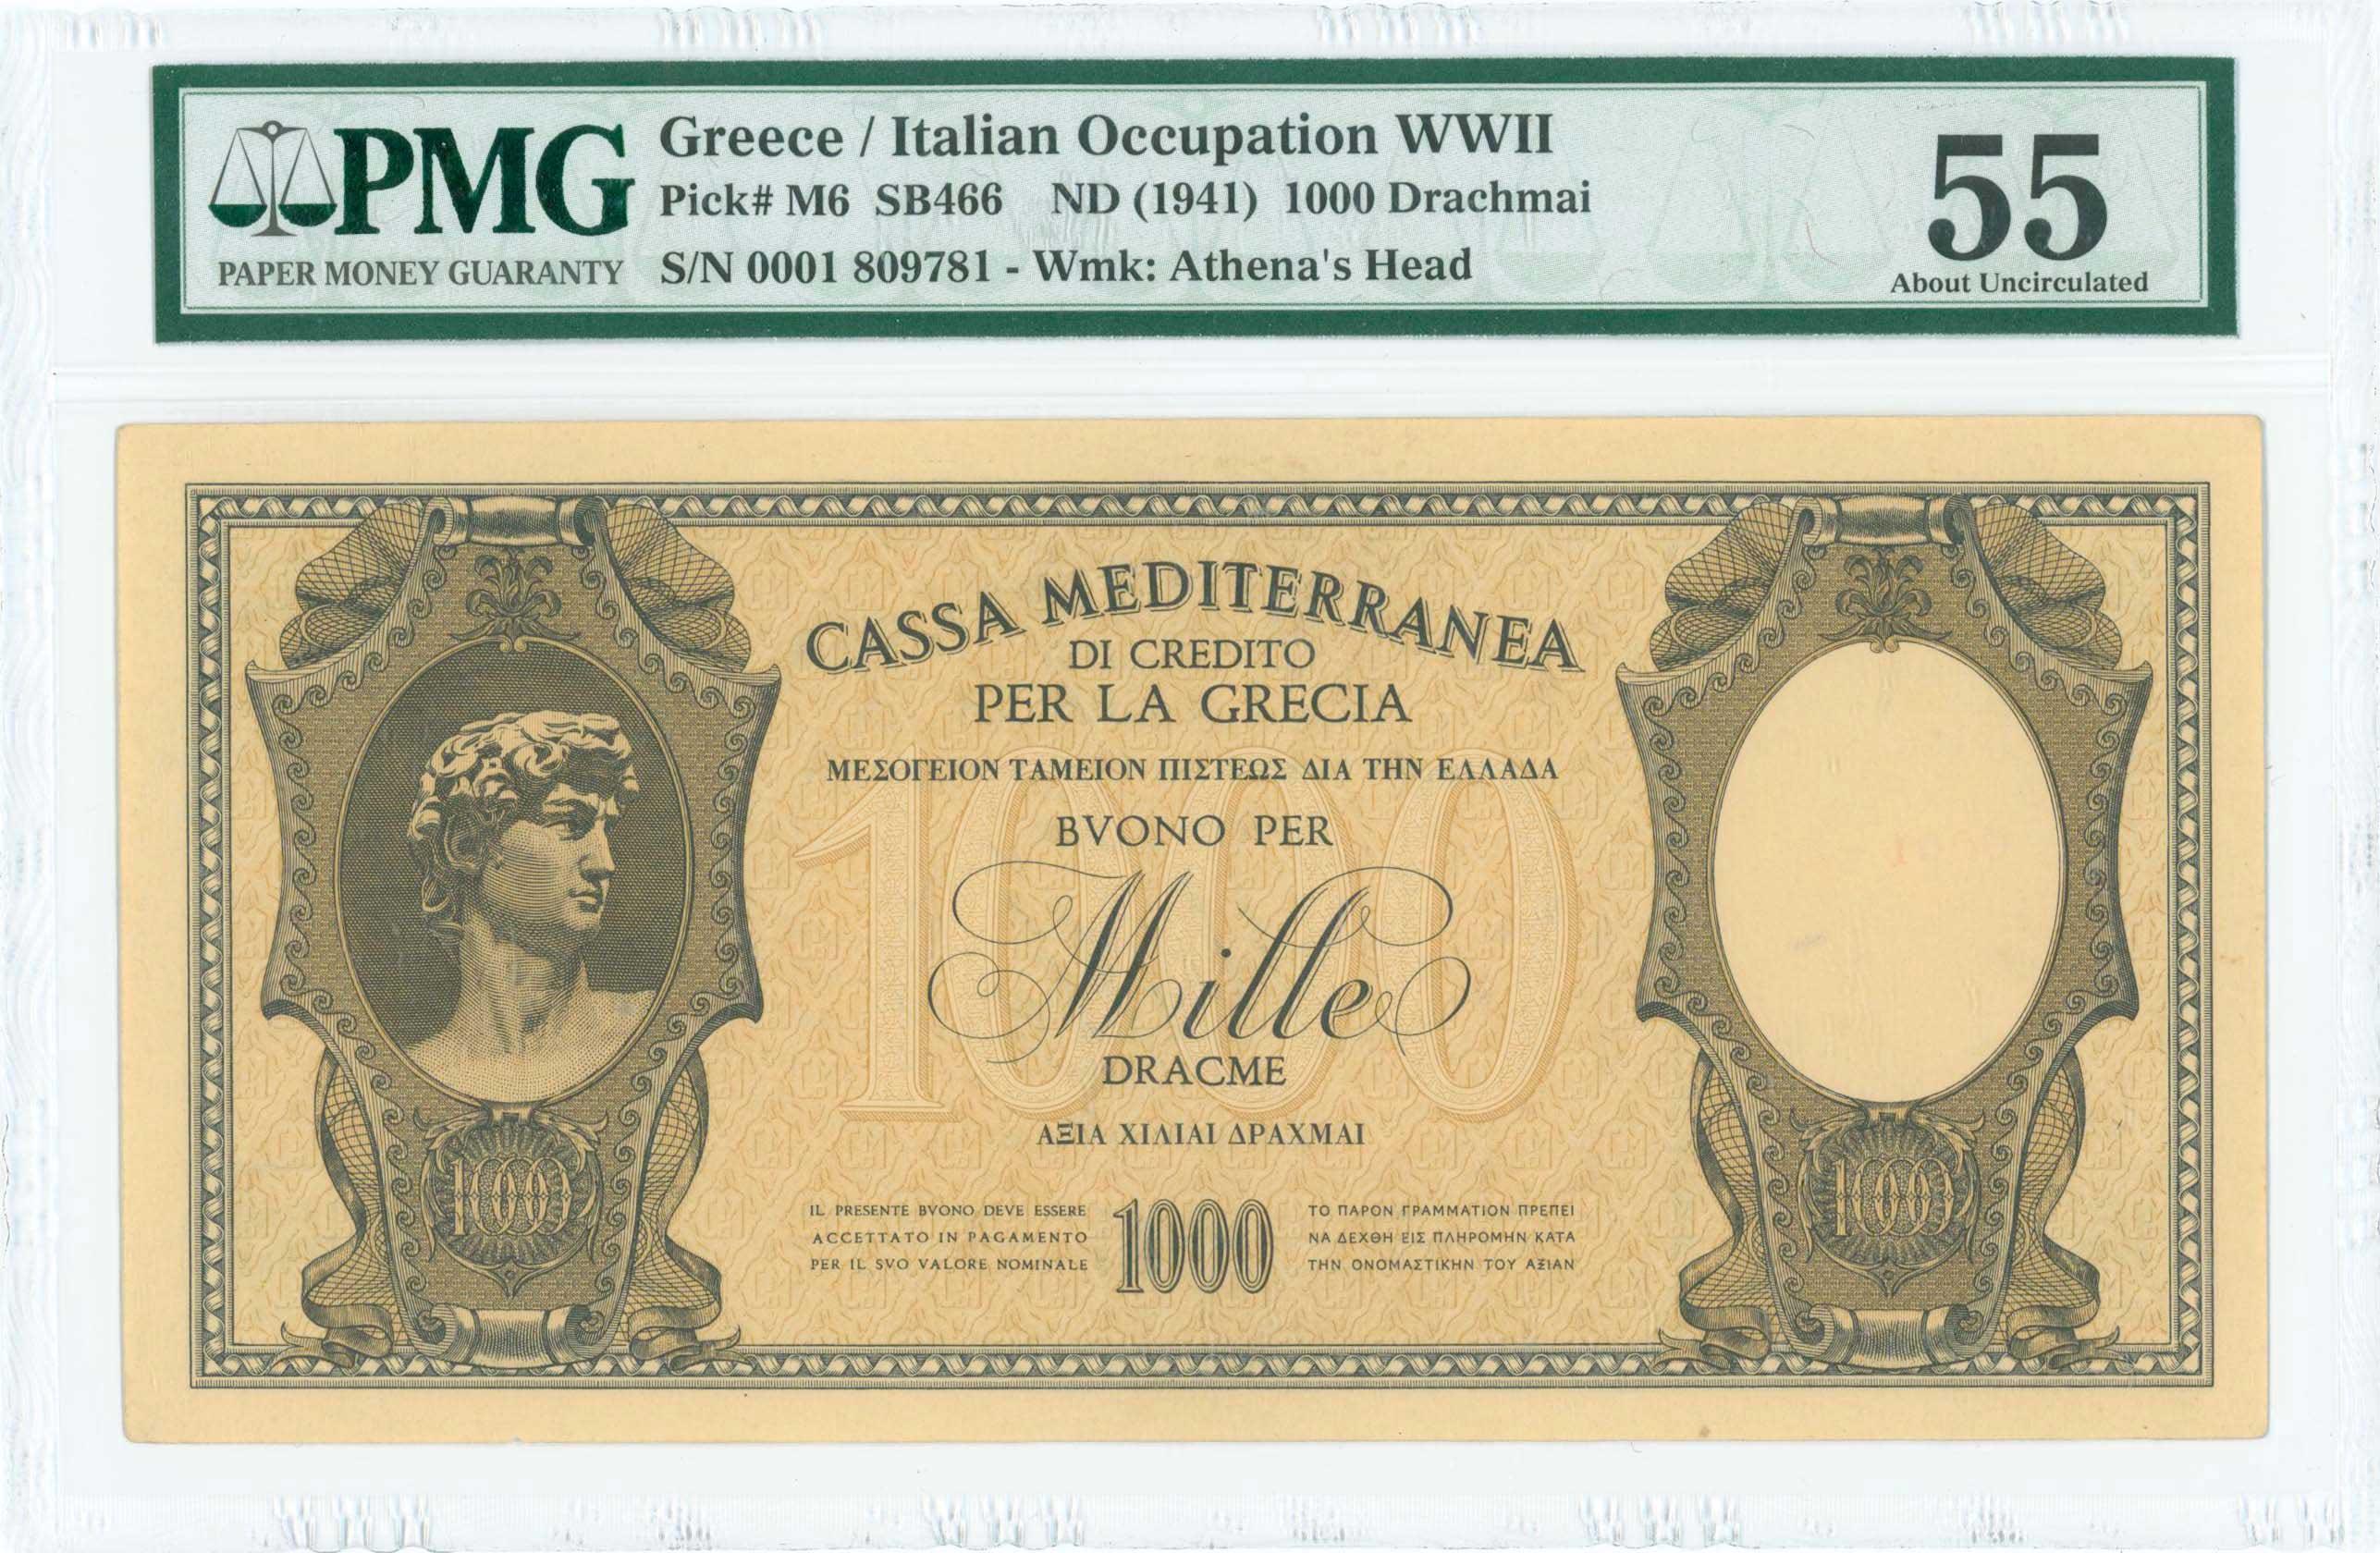 Lot 6738 - -  PAPER MONEY - BANKNOTES italian occupation -  A. Karamitsos Public & Live Internet Auction 671 (Part A)